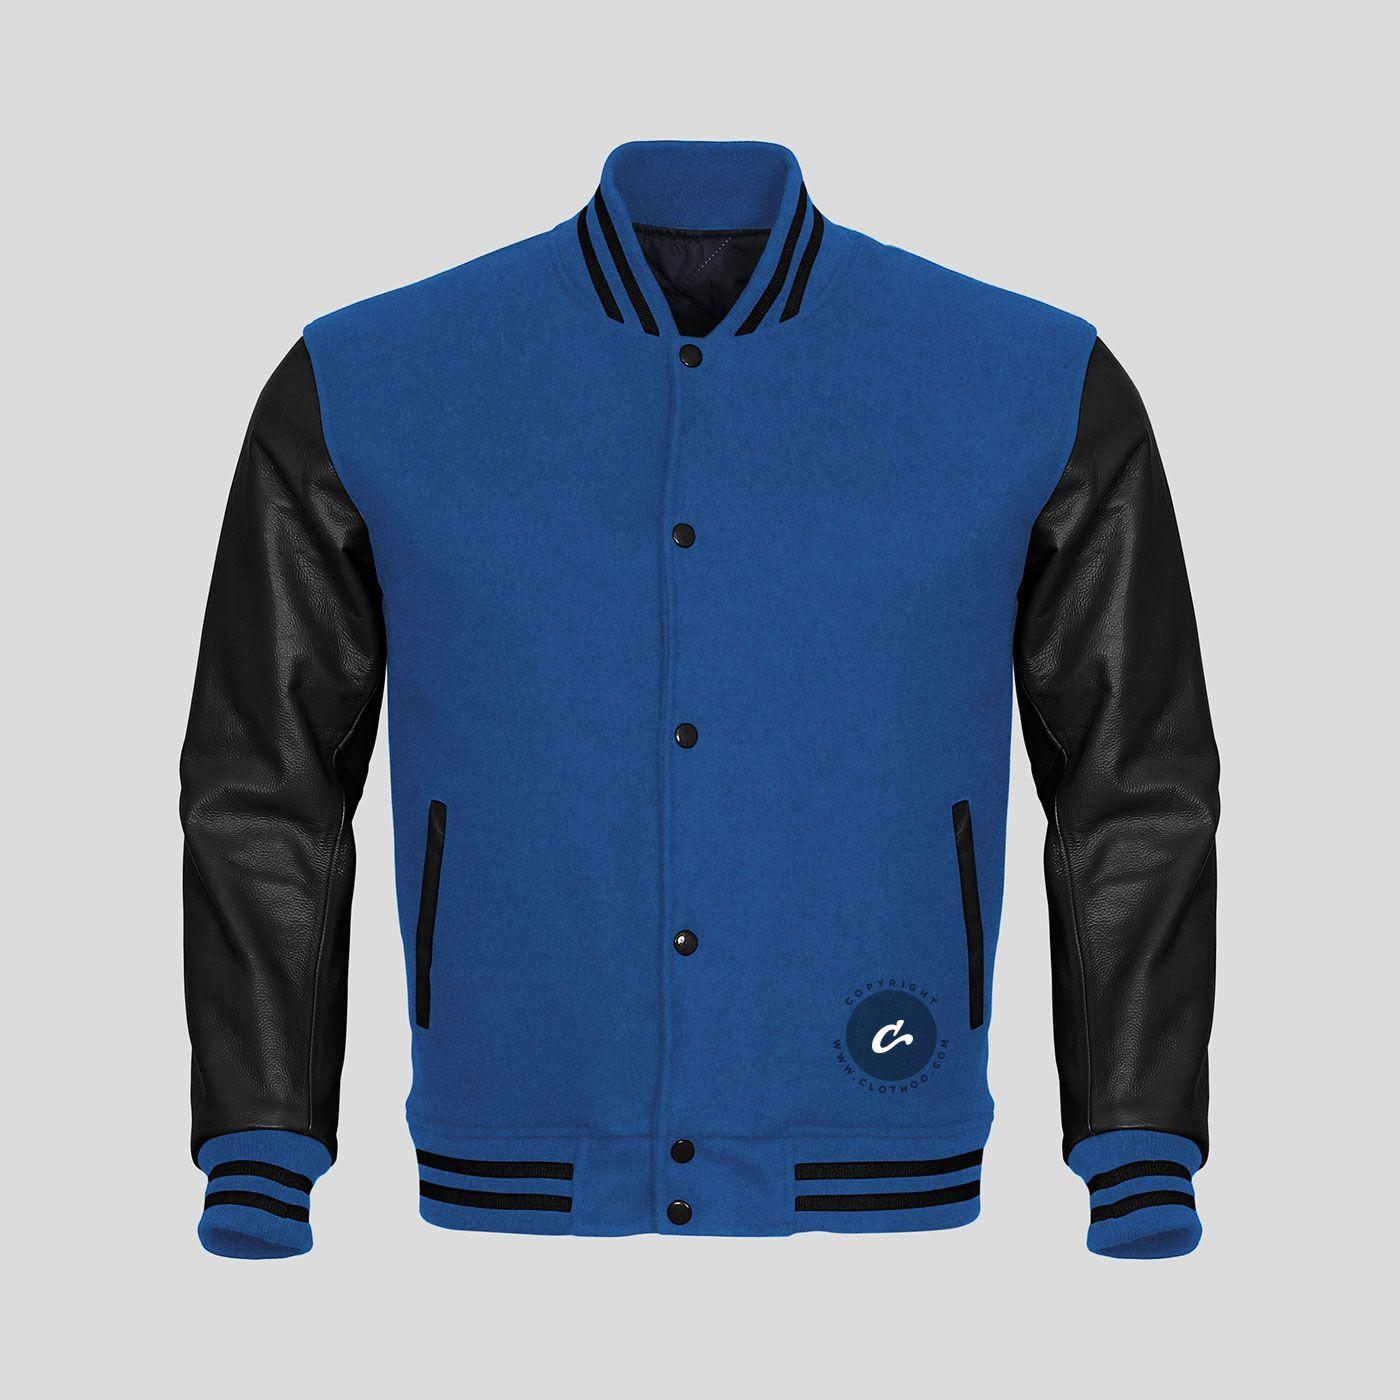 Black Leather Sleeves Blue Wool Varsity Jacket Leather